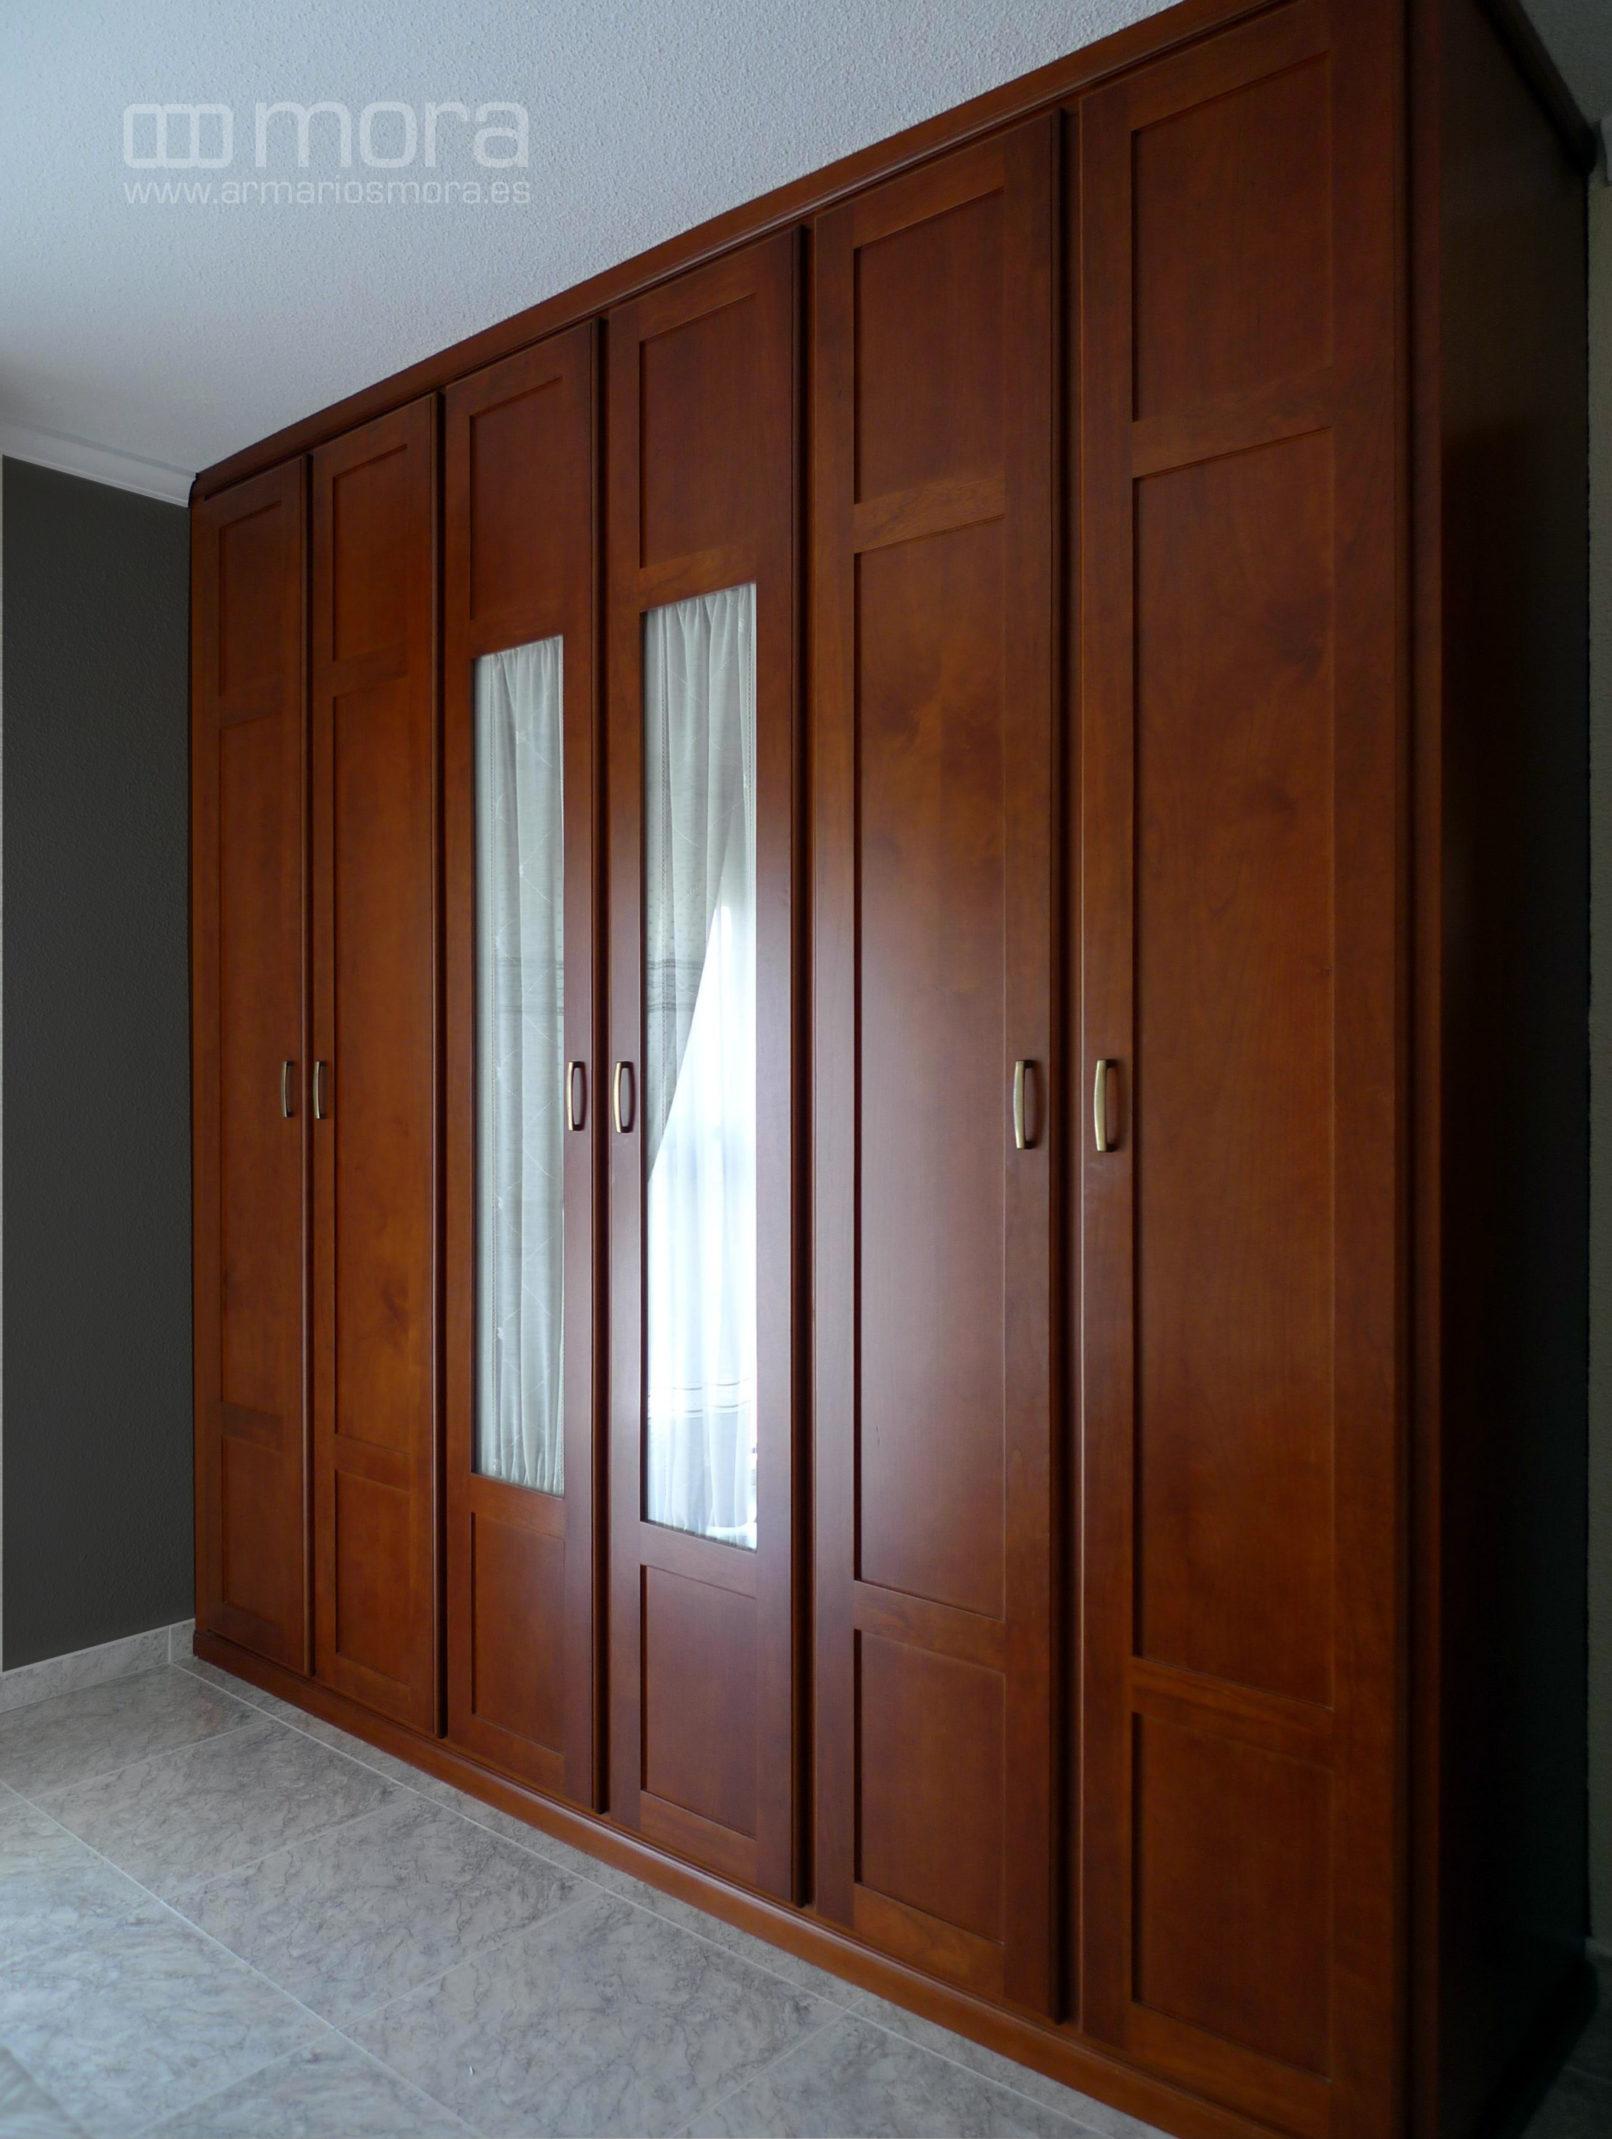 e0ba354c Armario empotrado con costado lateral también en madera de cerezo oscuro  con puertas centrales para visillo.